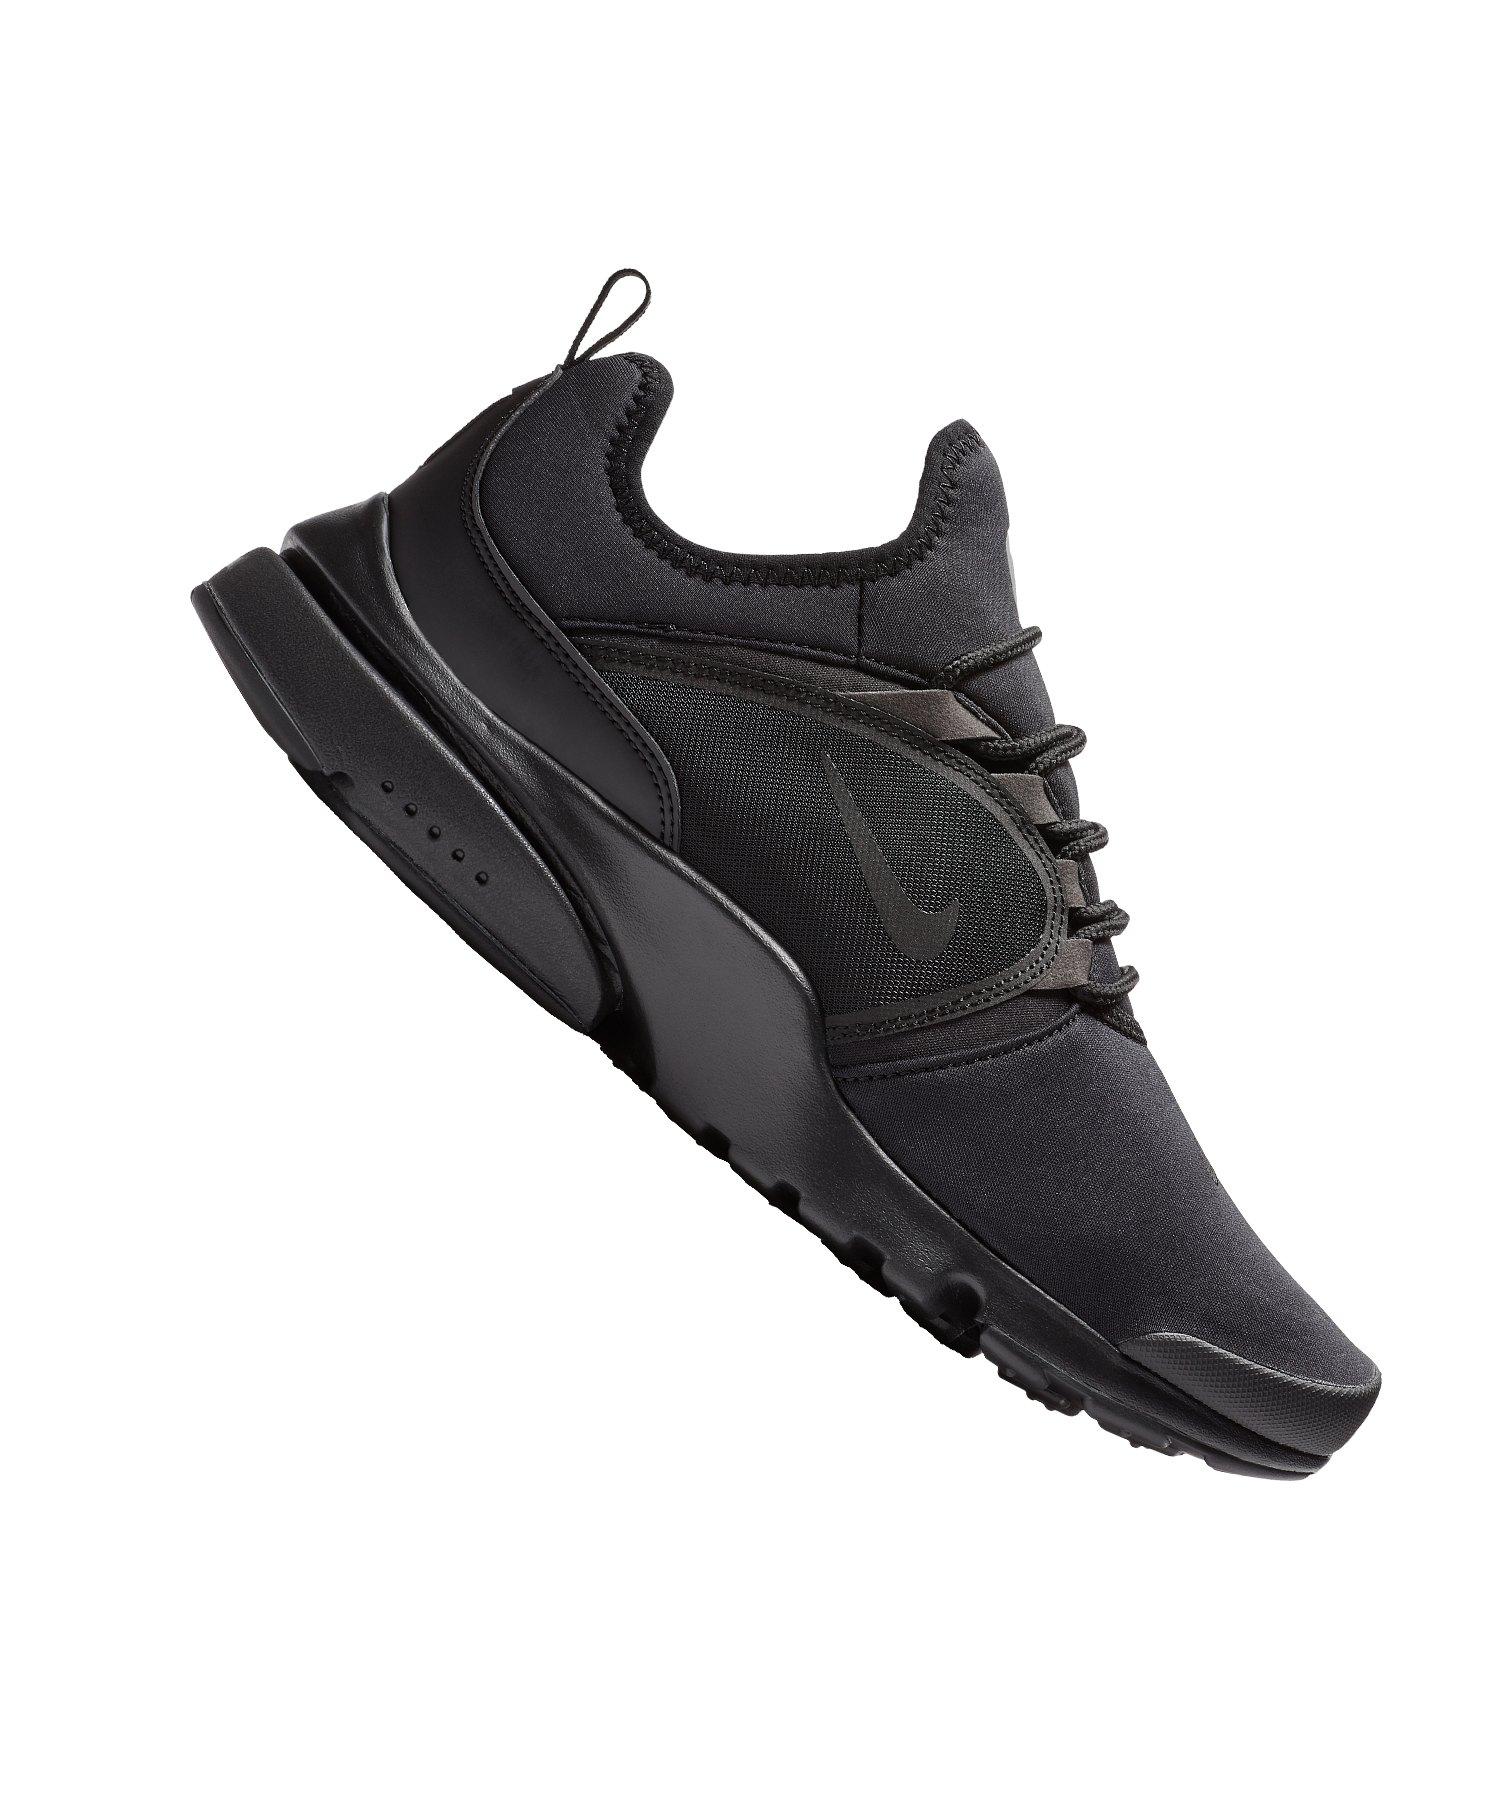 8298261cfd869 Nike Presto Fly World Sneaker Schwarz F003 - schwarz